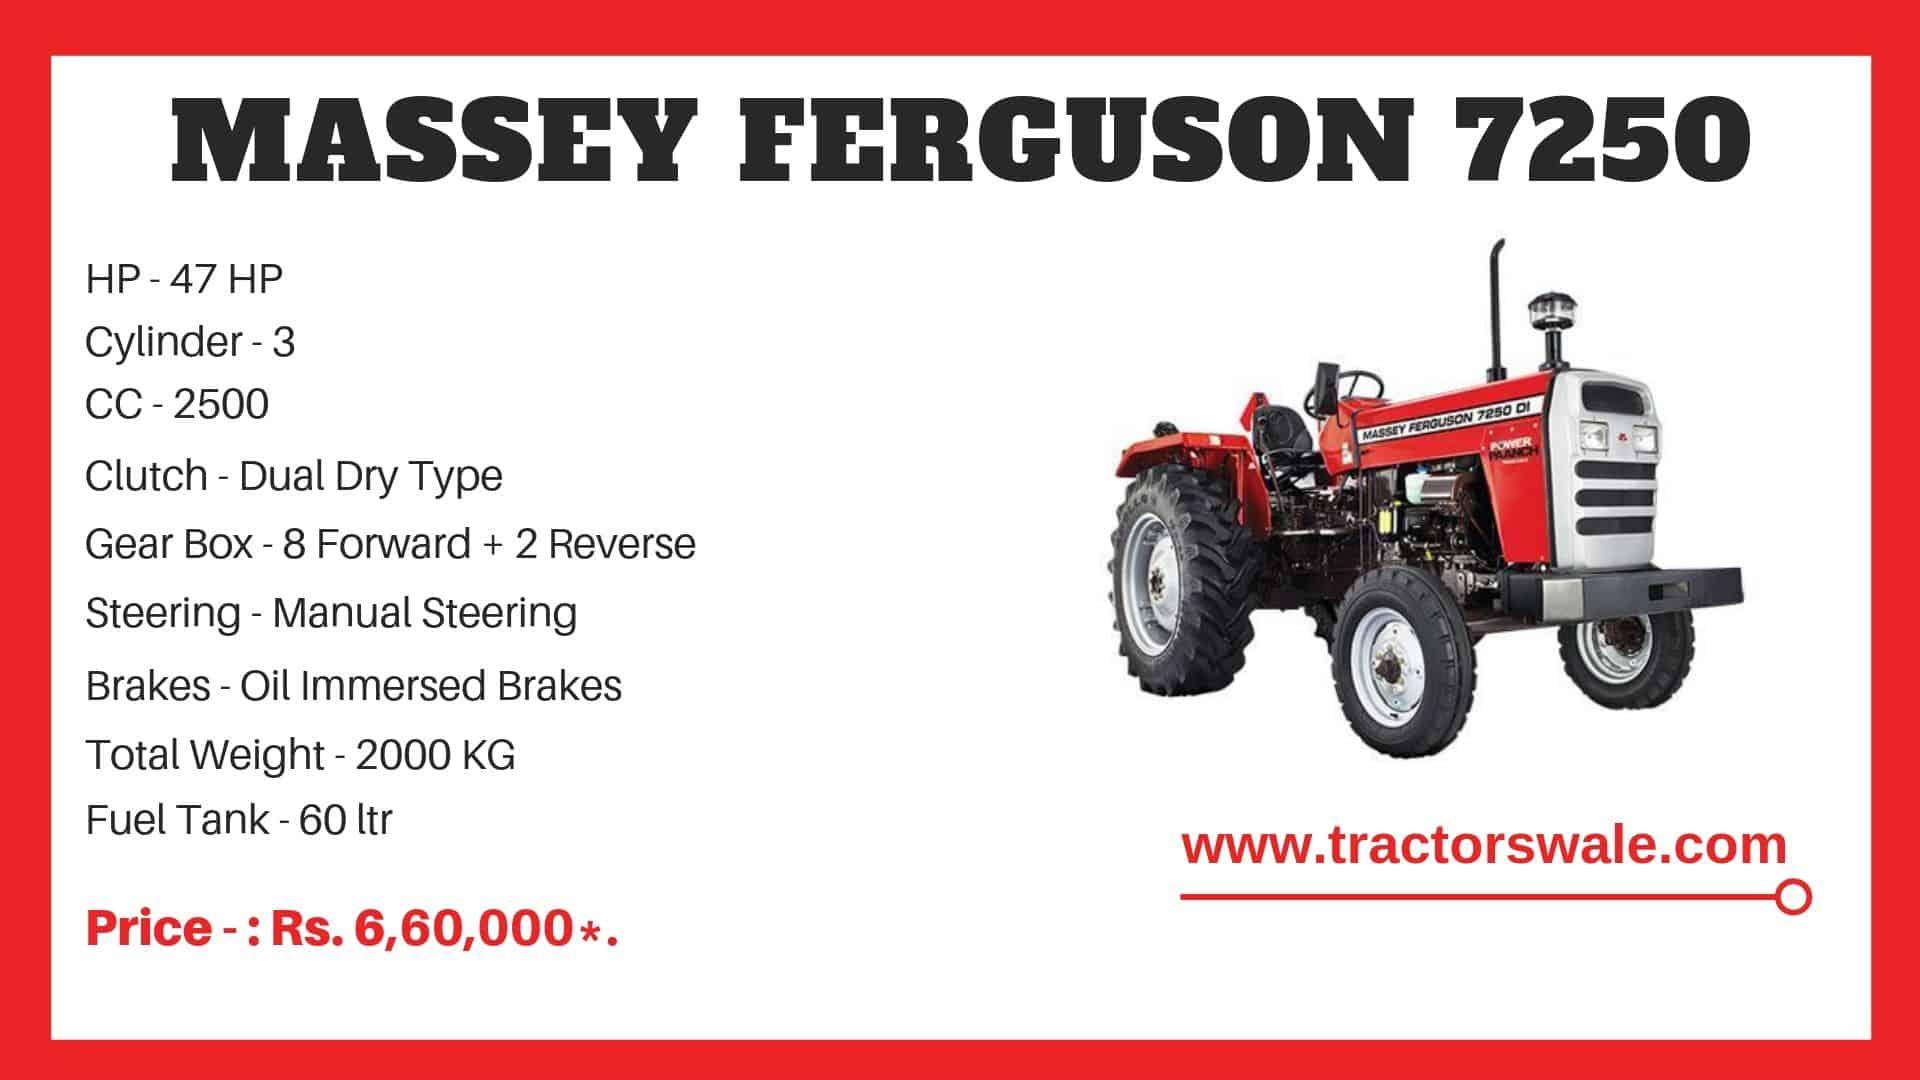 Massey Ferguson 7250 Specifications